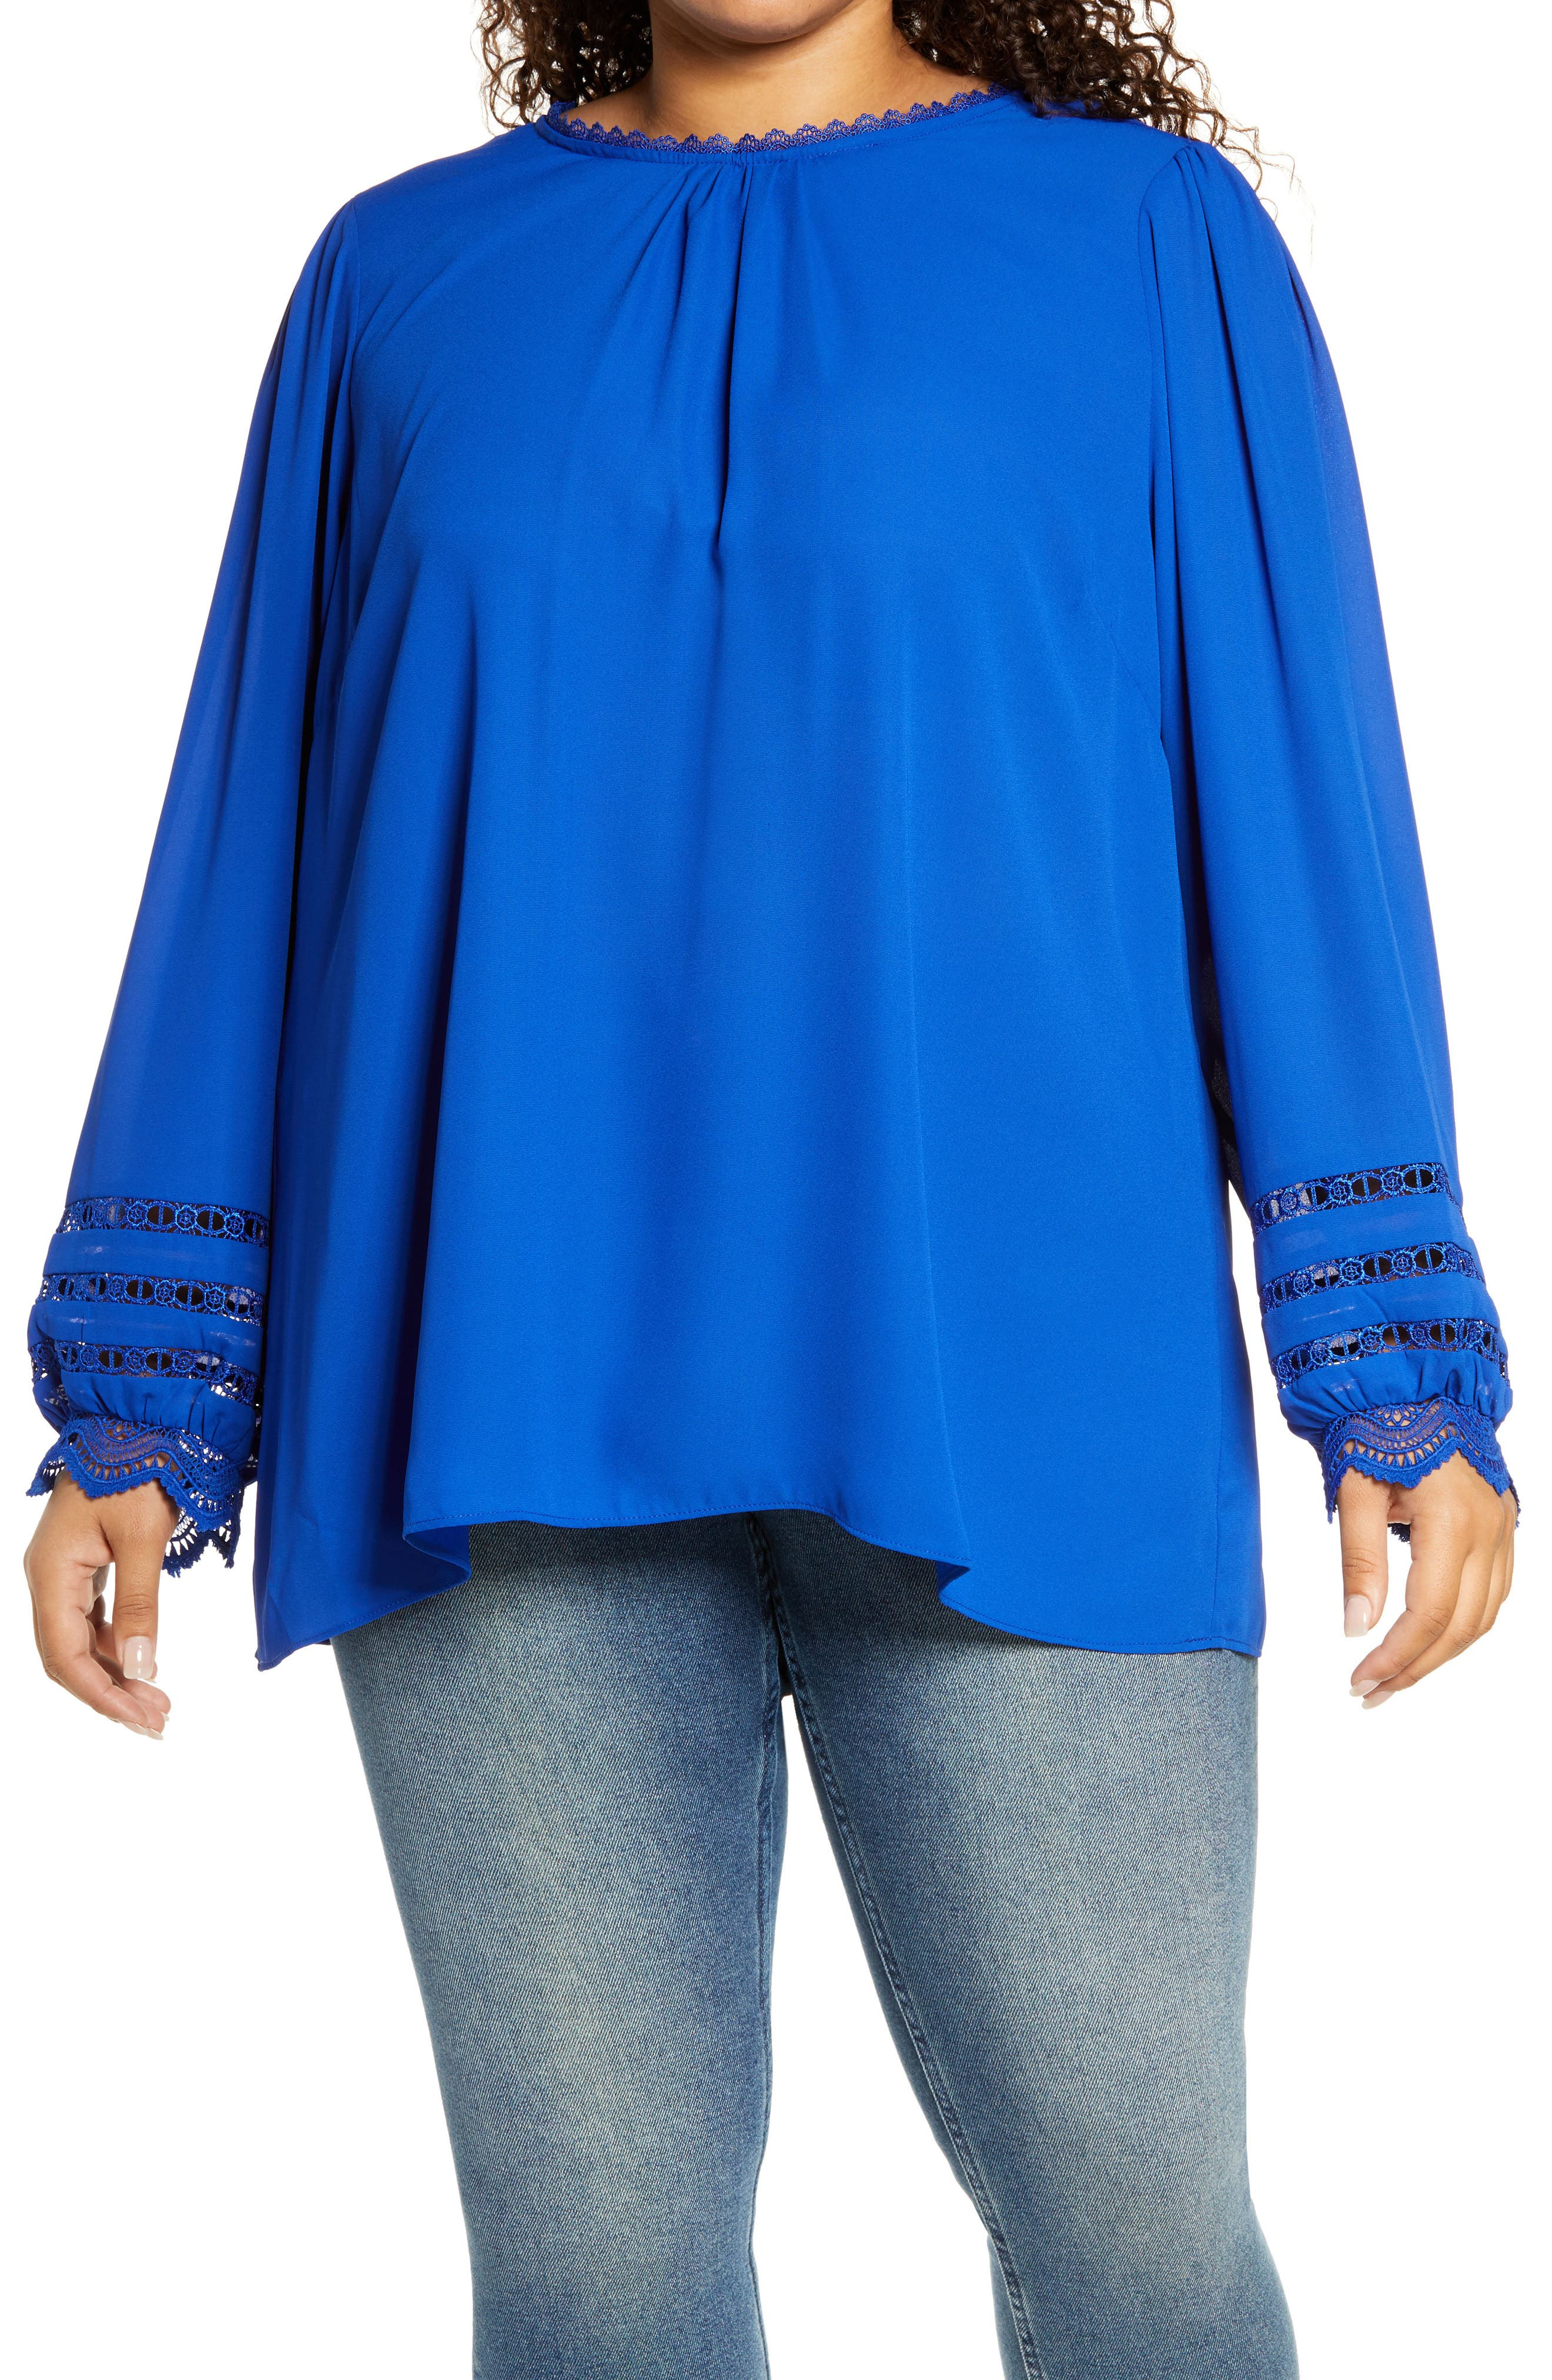 Lace Desire Blouson Sleeve Top